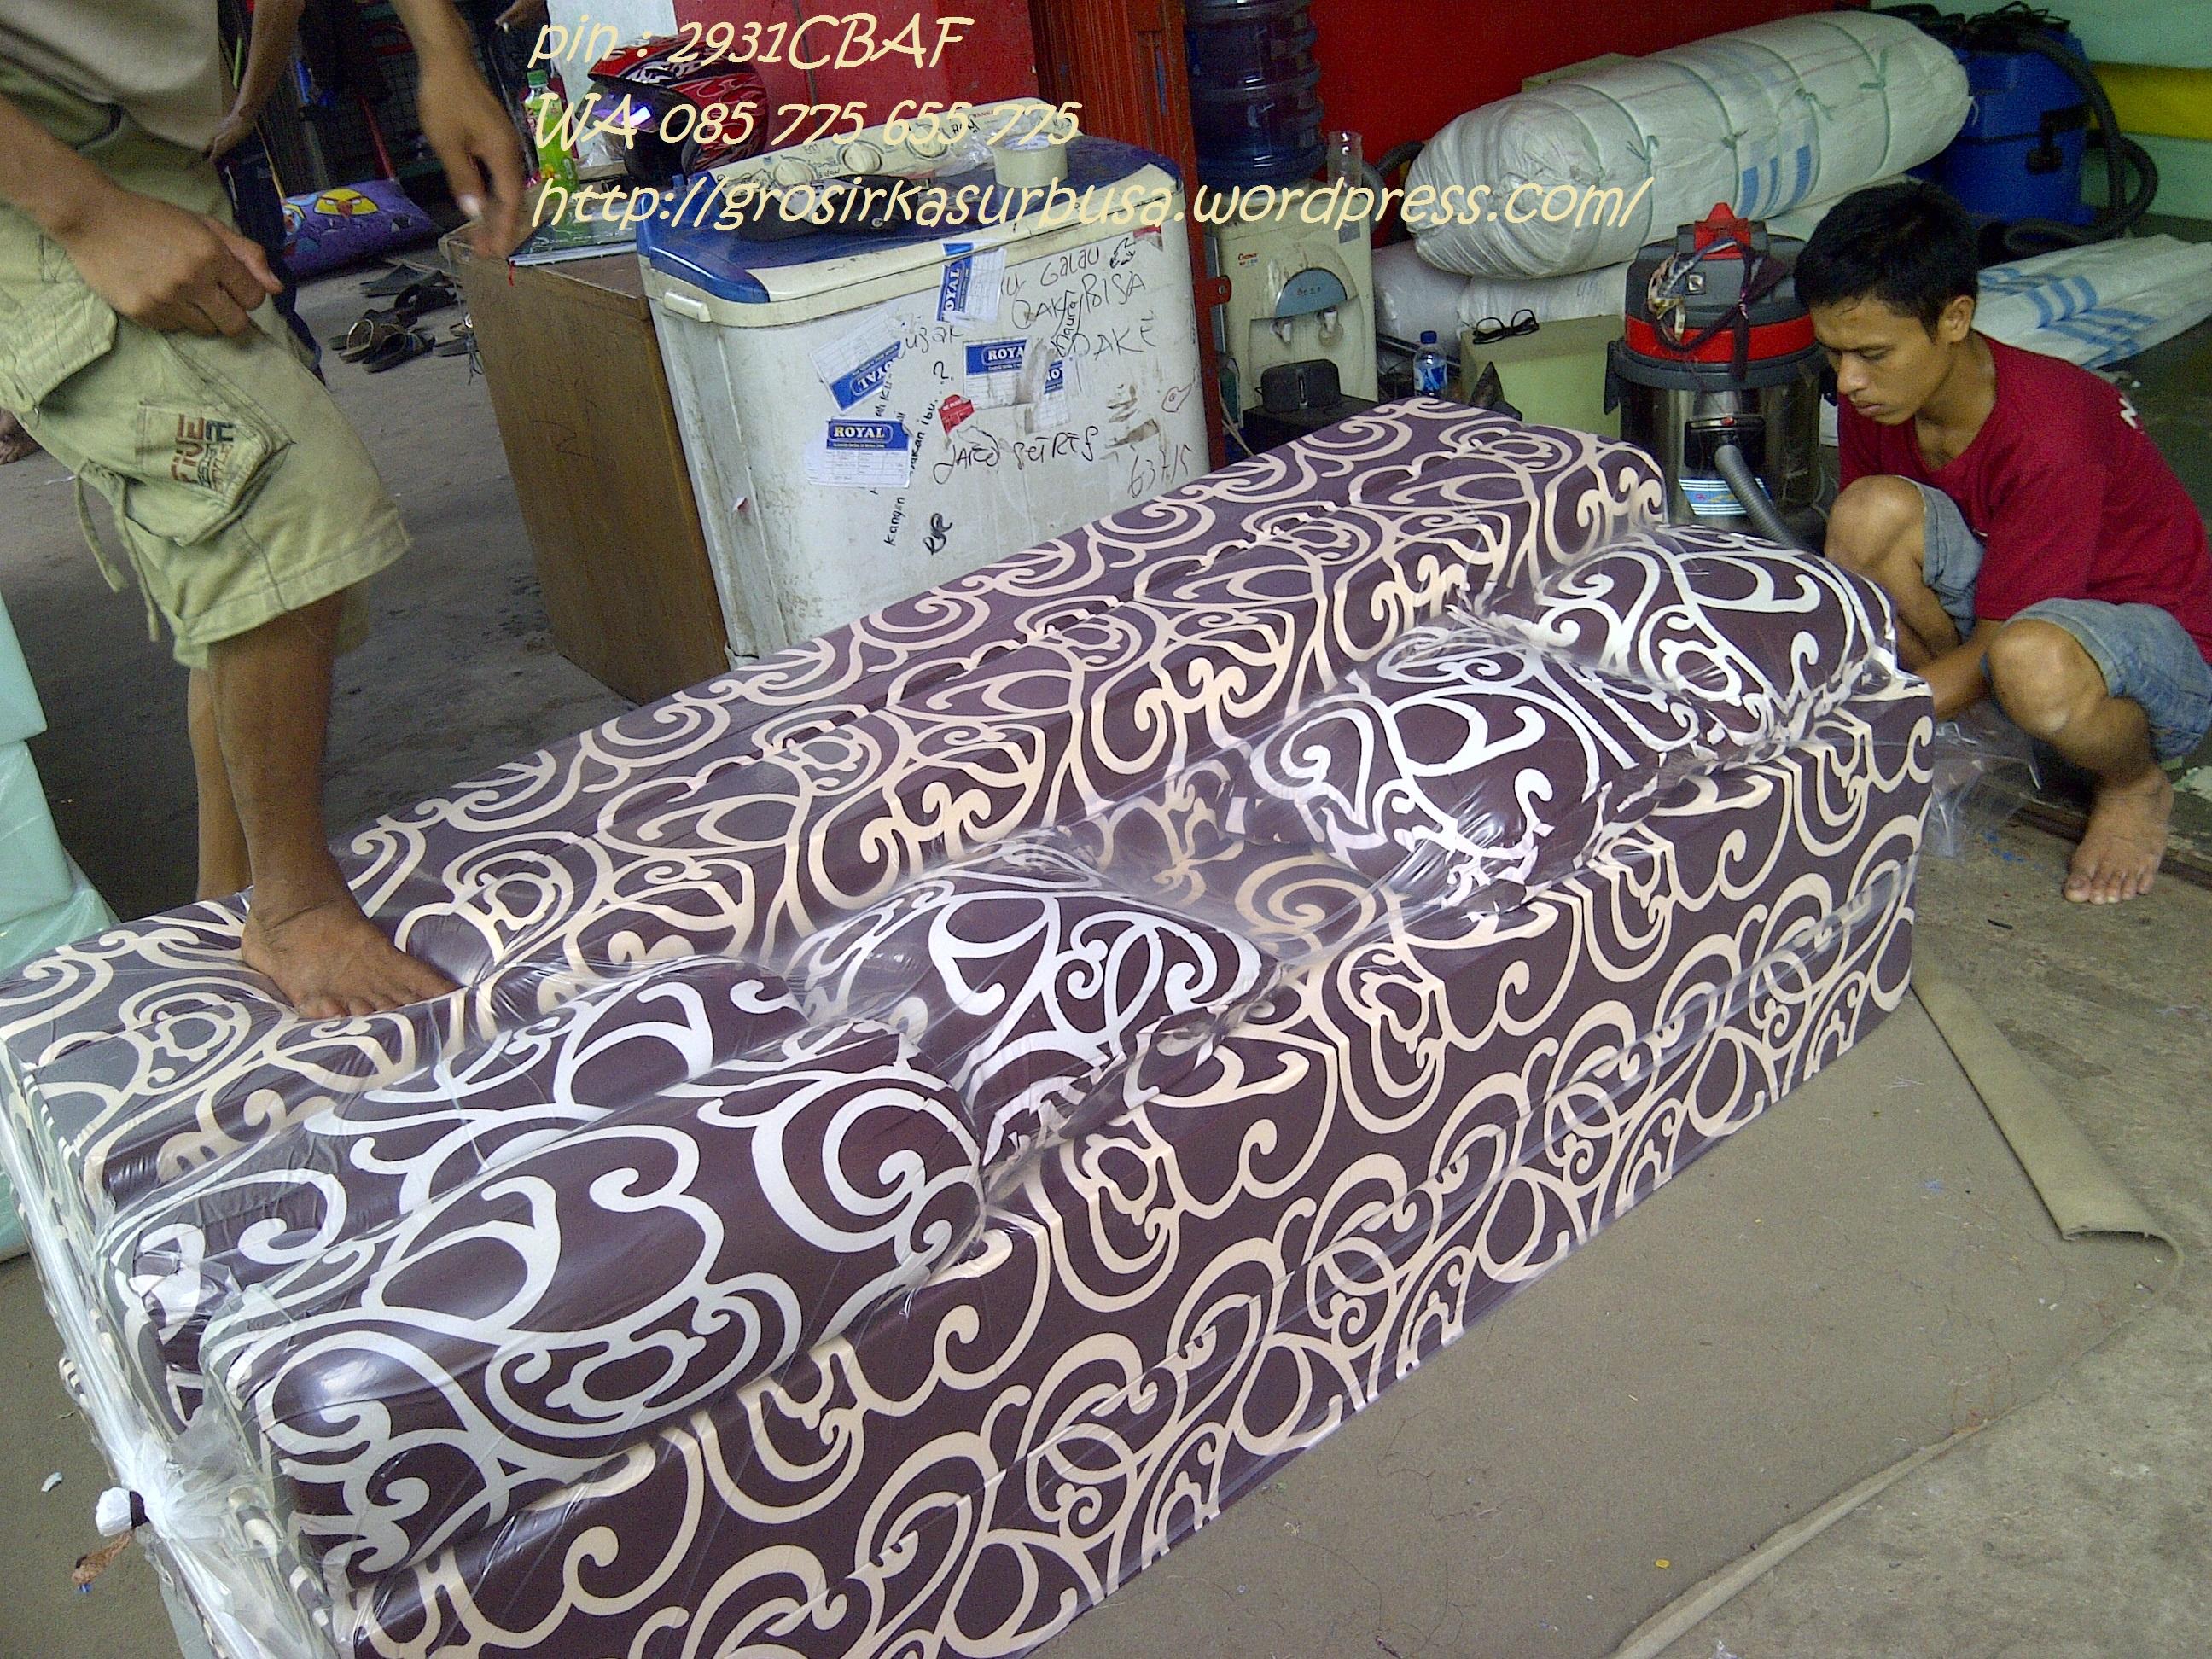 sofa bed kasur busa lipat inoac jakarta cheap sofas sets for sale harga